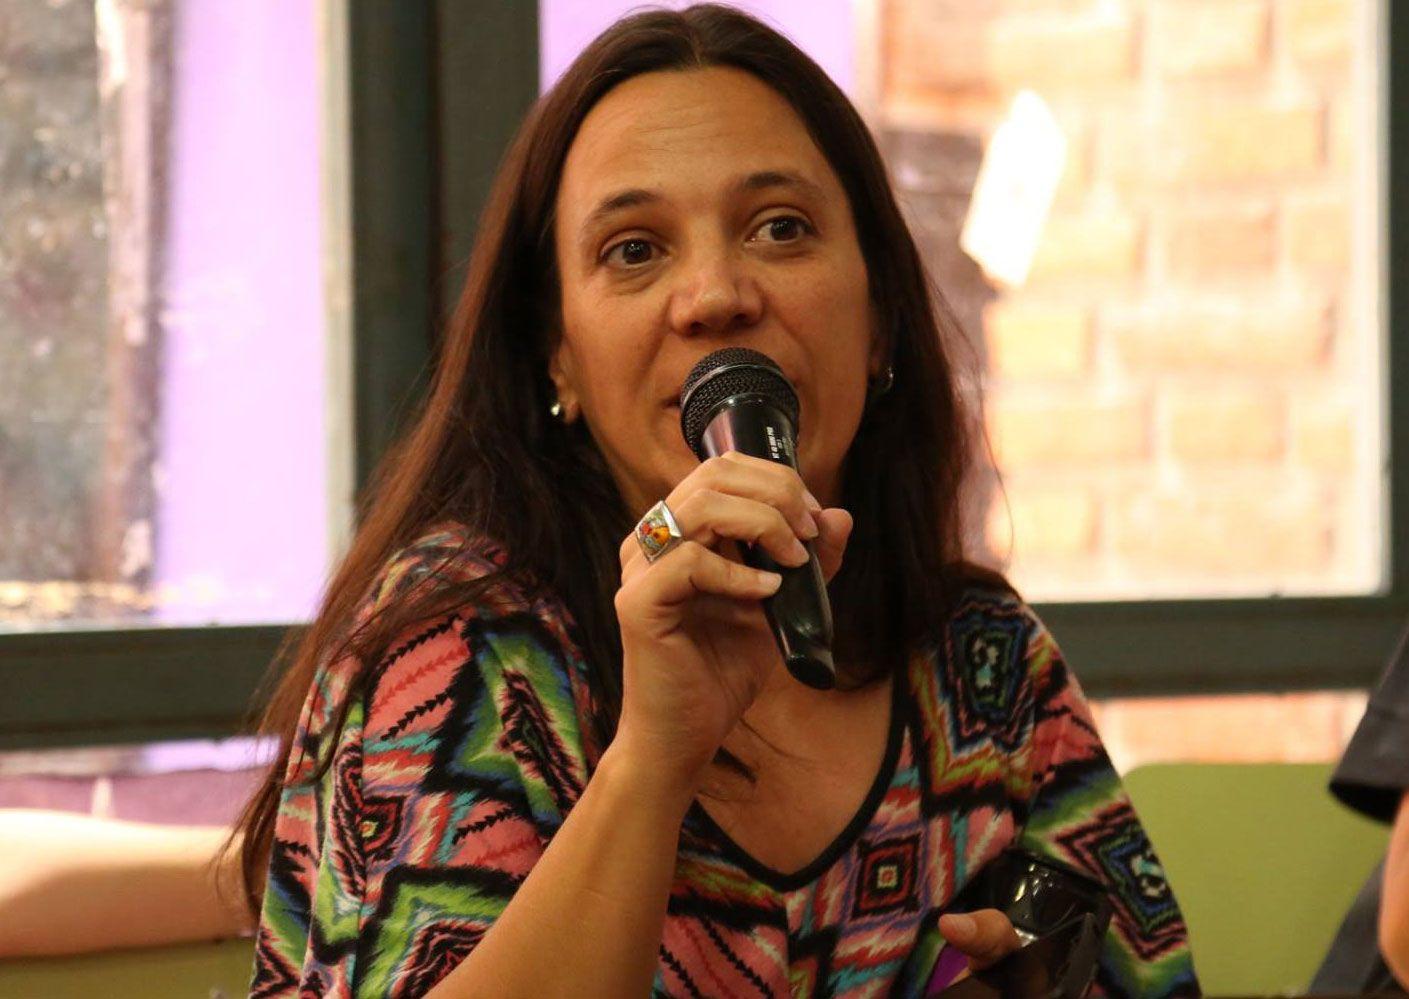 Mariana Vargas